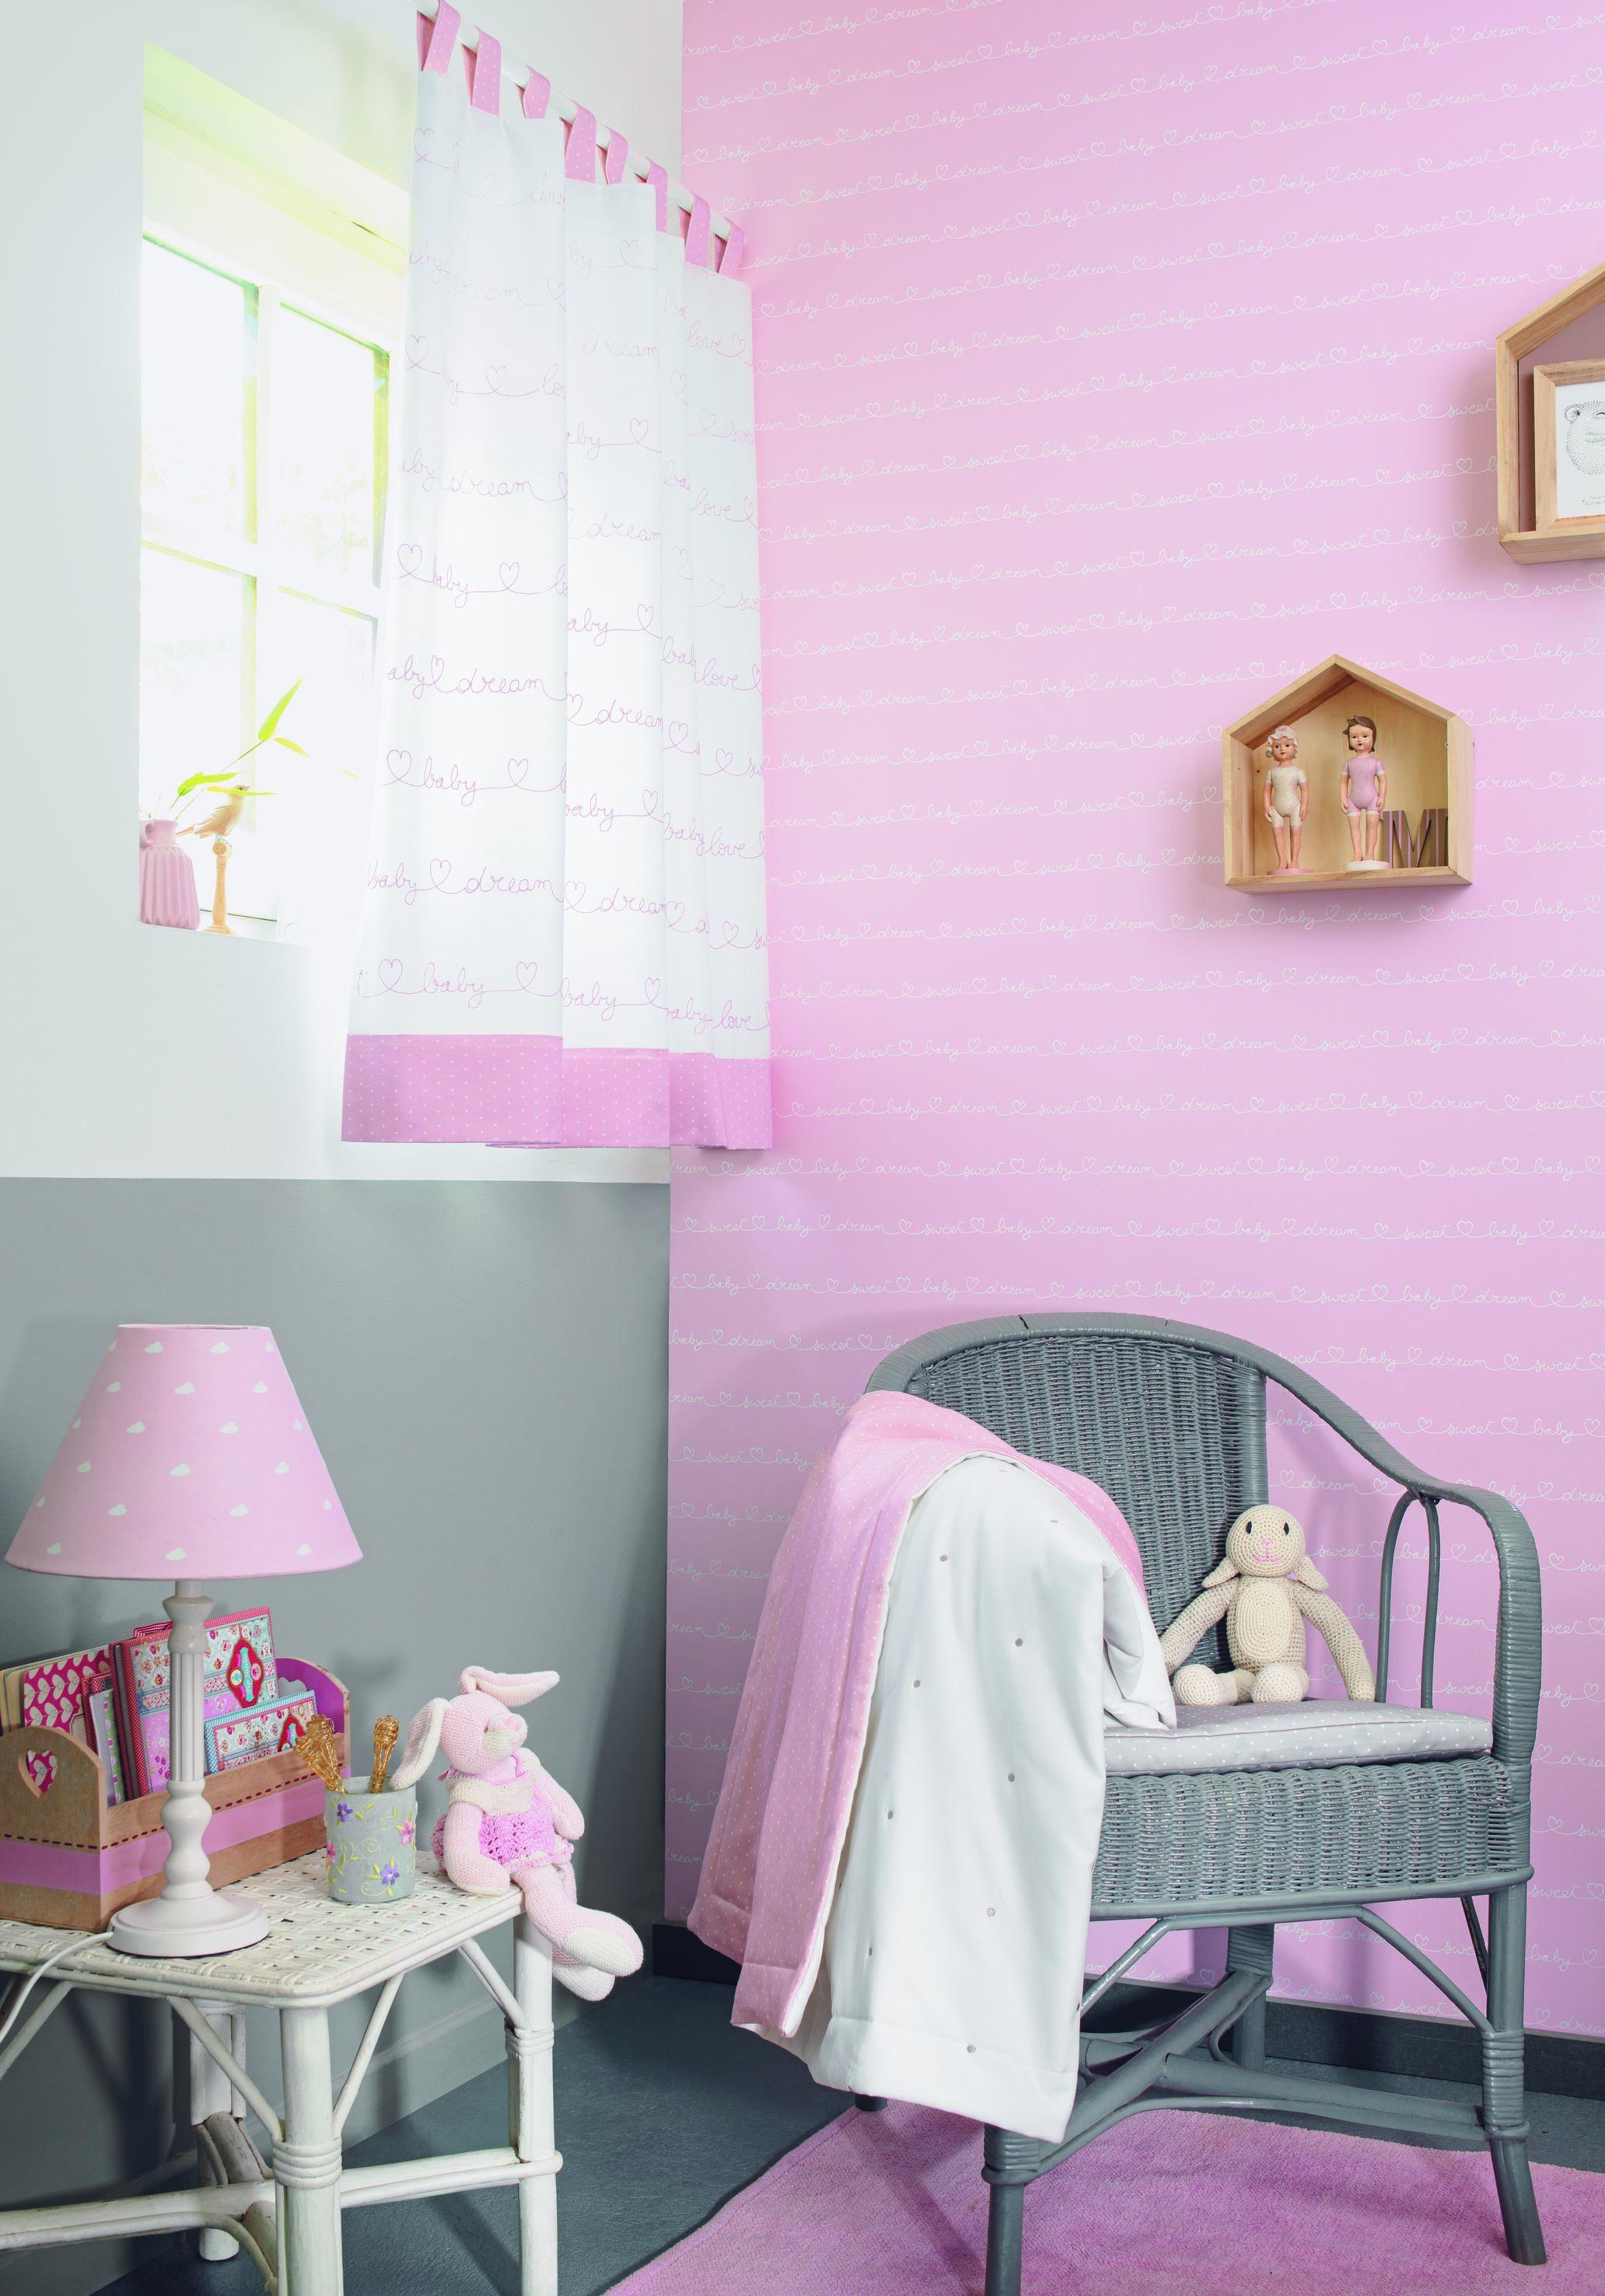 pin by on papier peint b b. Black Bedroom Furniture Sets. Home Design Ideas